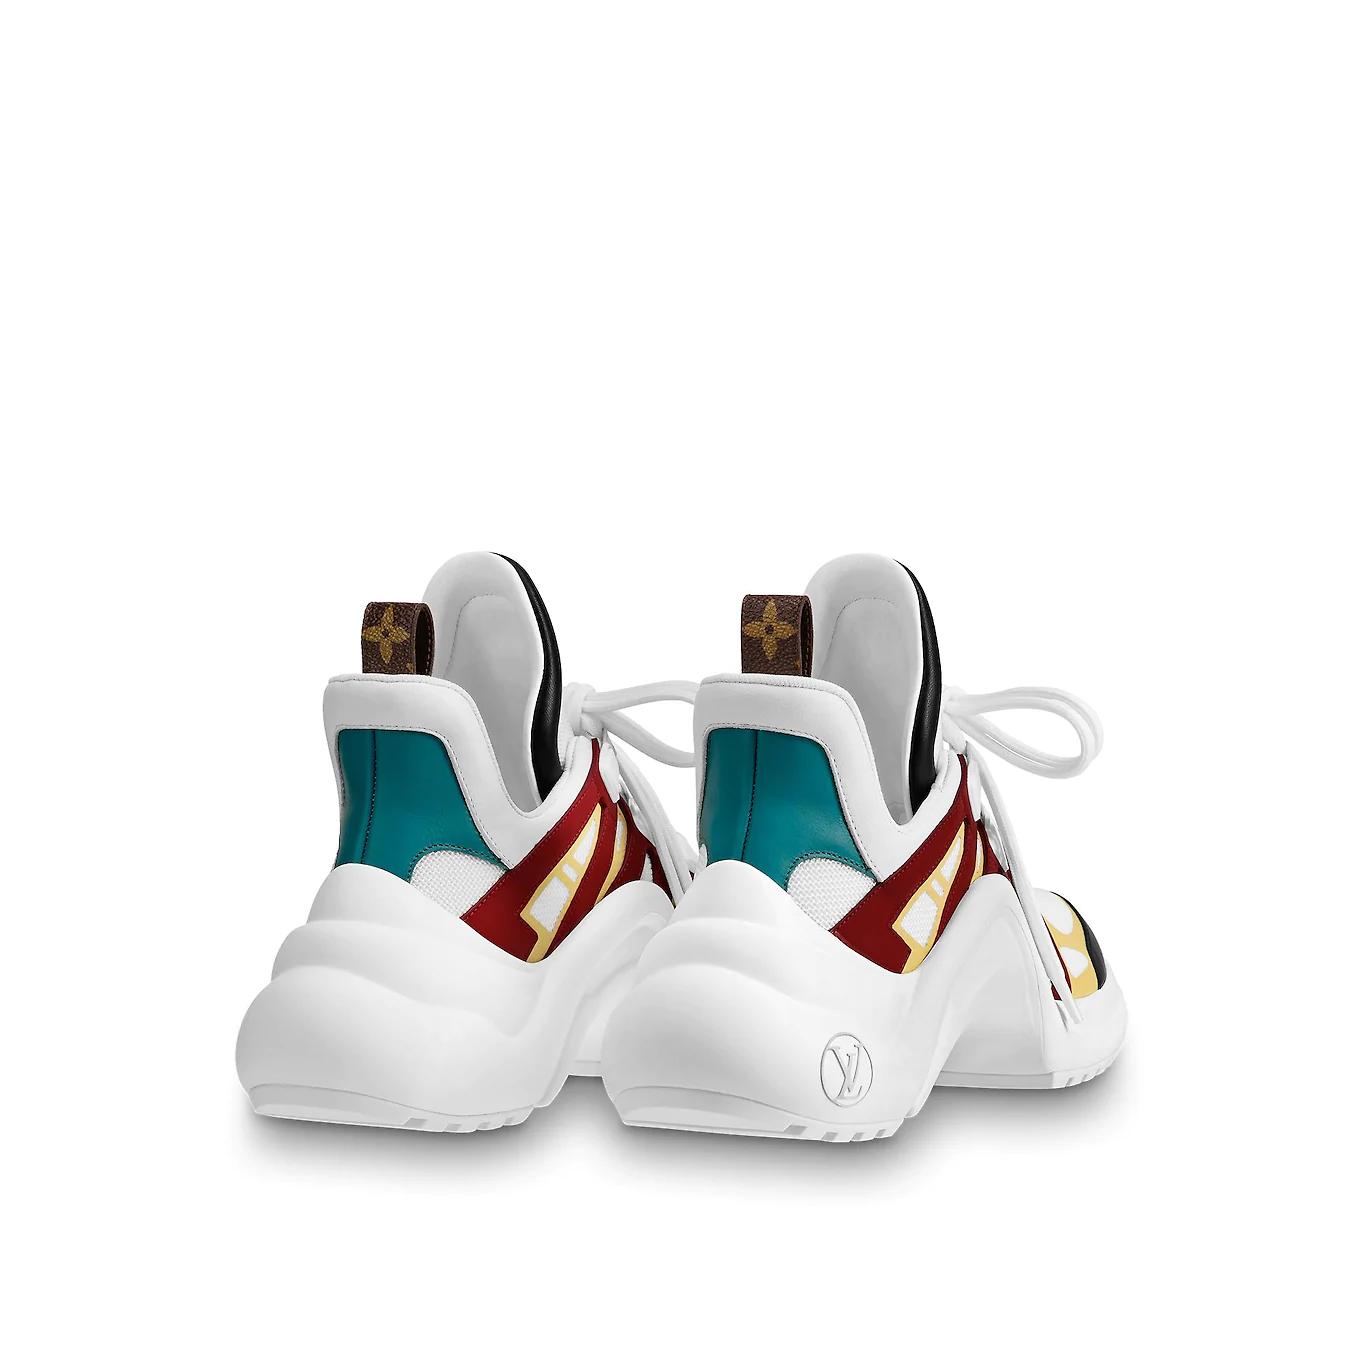 1f9b070f812e LV ARCHLIGHT SNEAKER Terracotta - Brands Blogger